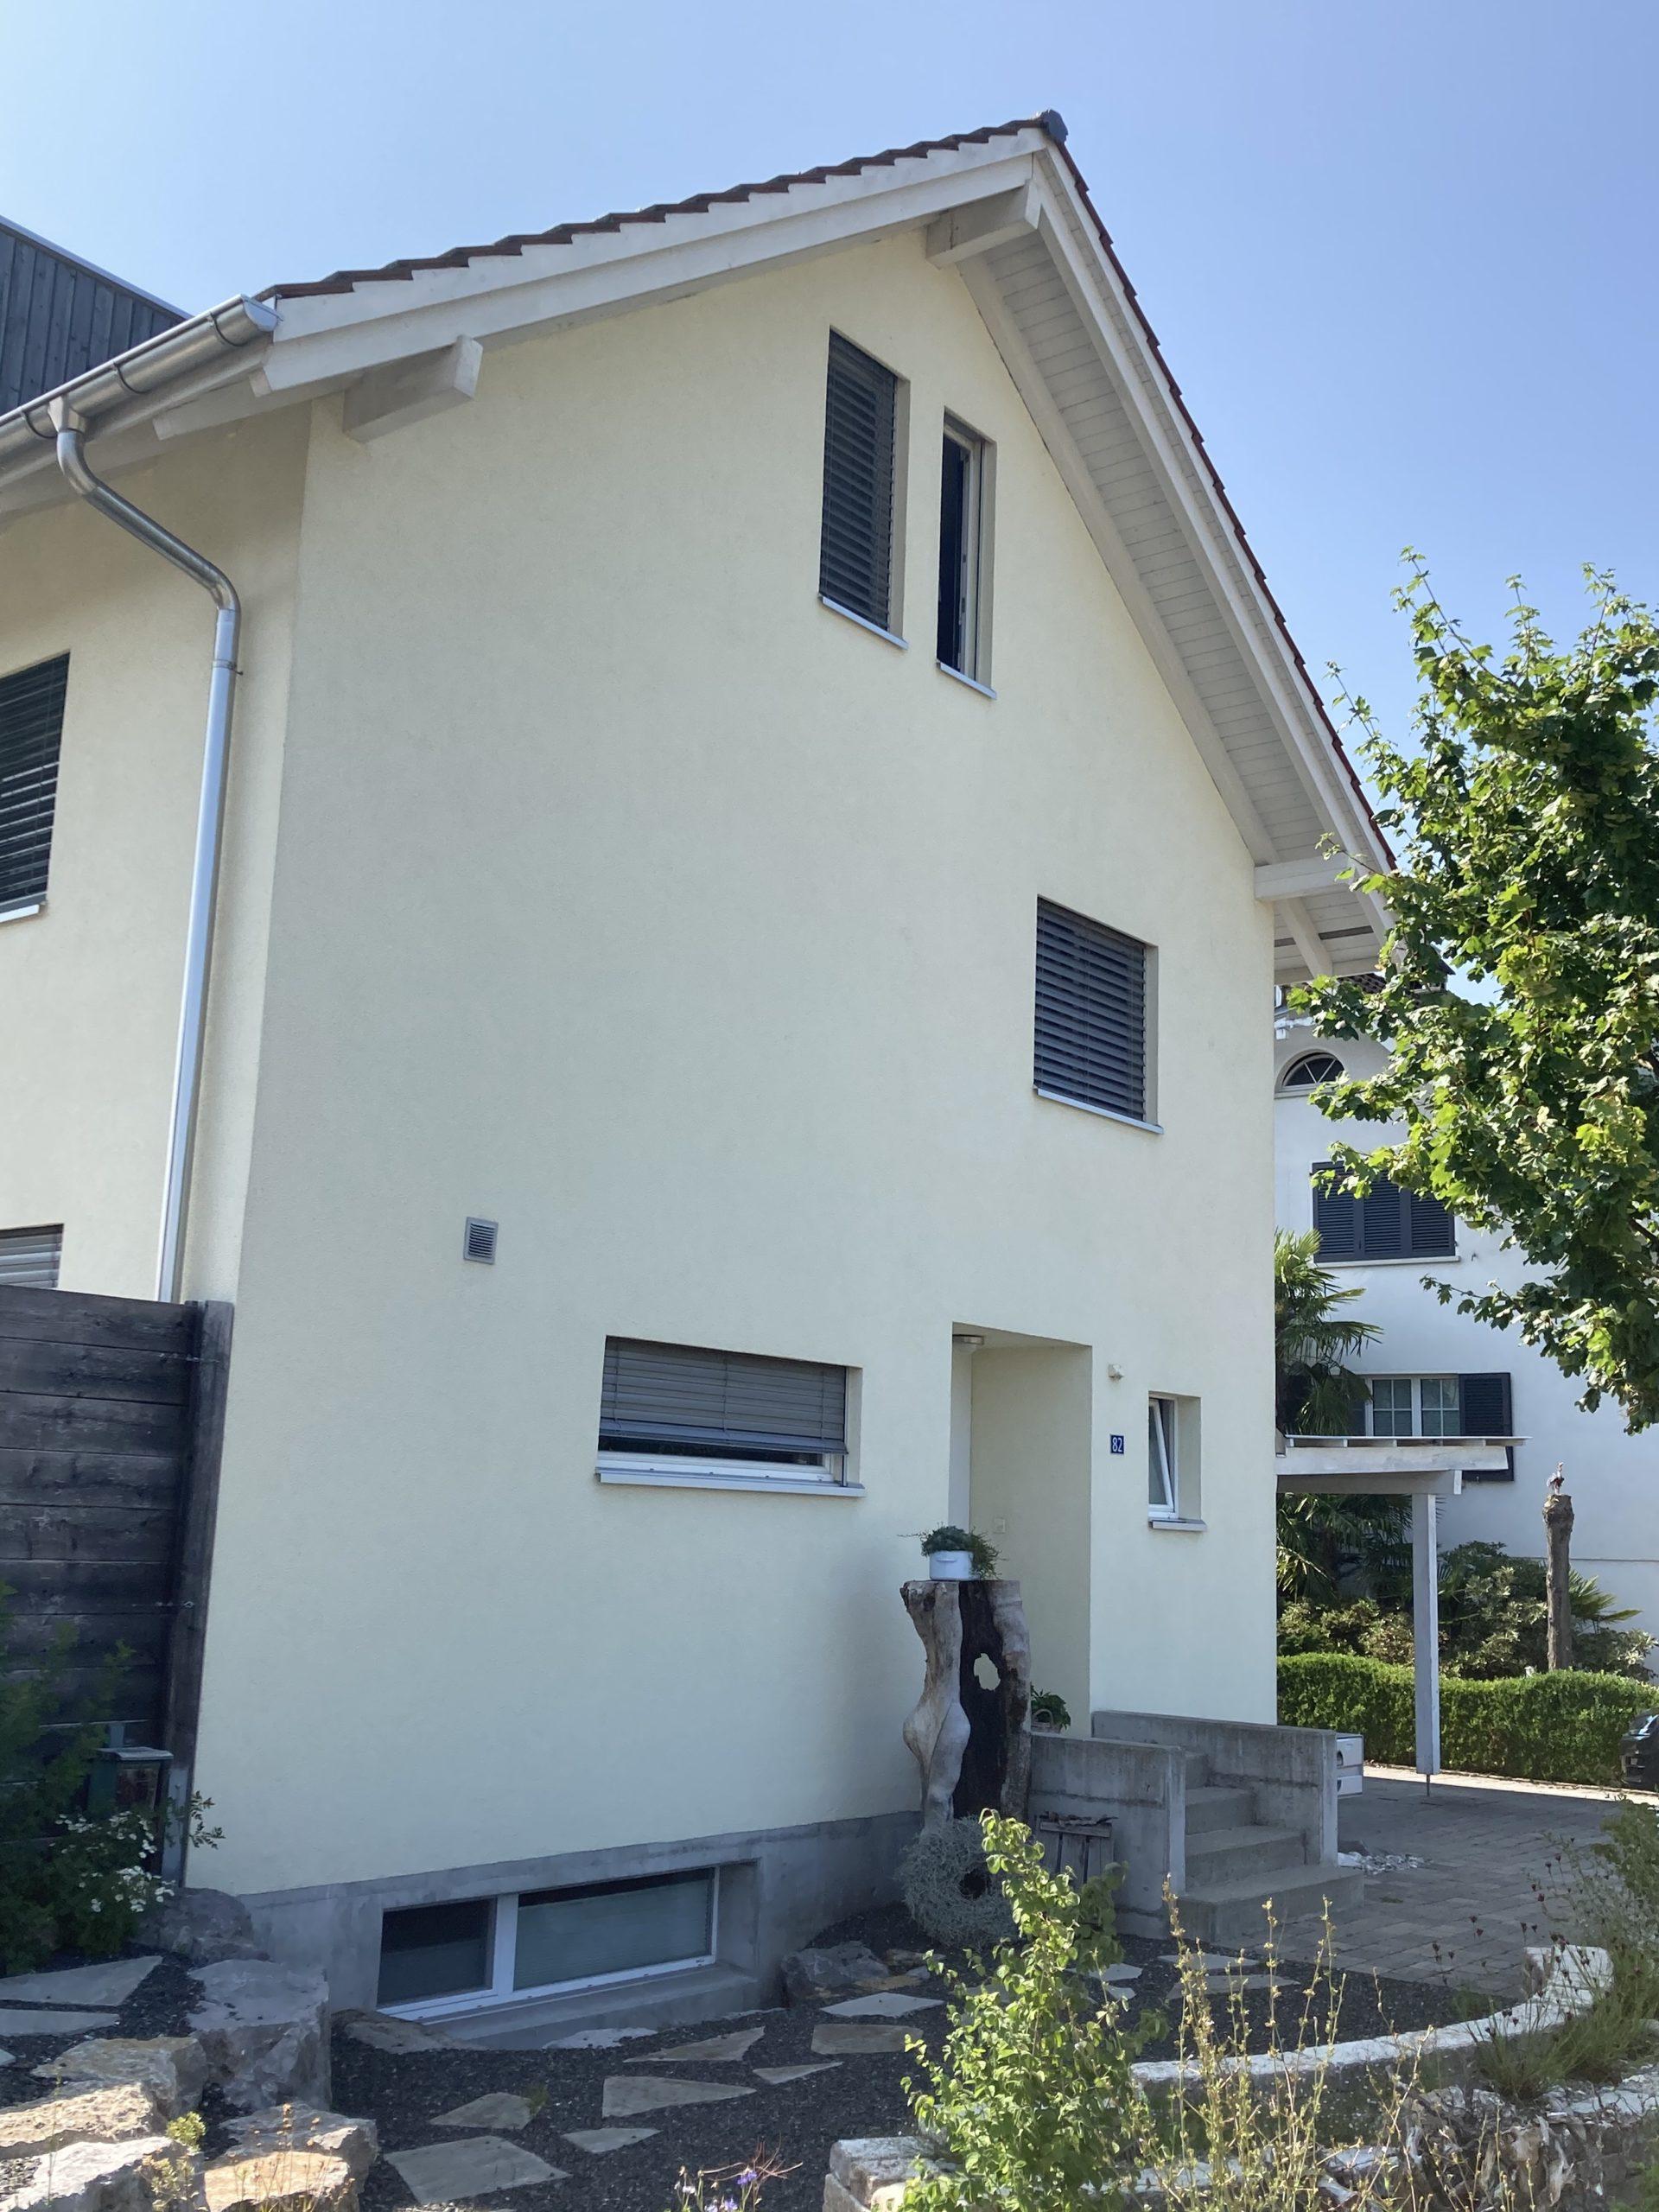 https://www.koster-gs.ch/wp-content/uploads/2021/08/Dobler-Balgach-Fassade-nachher1-scaled.jpg